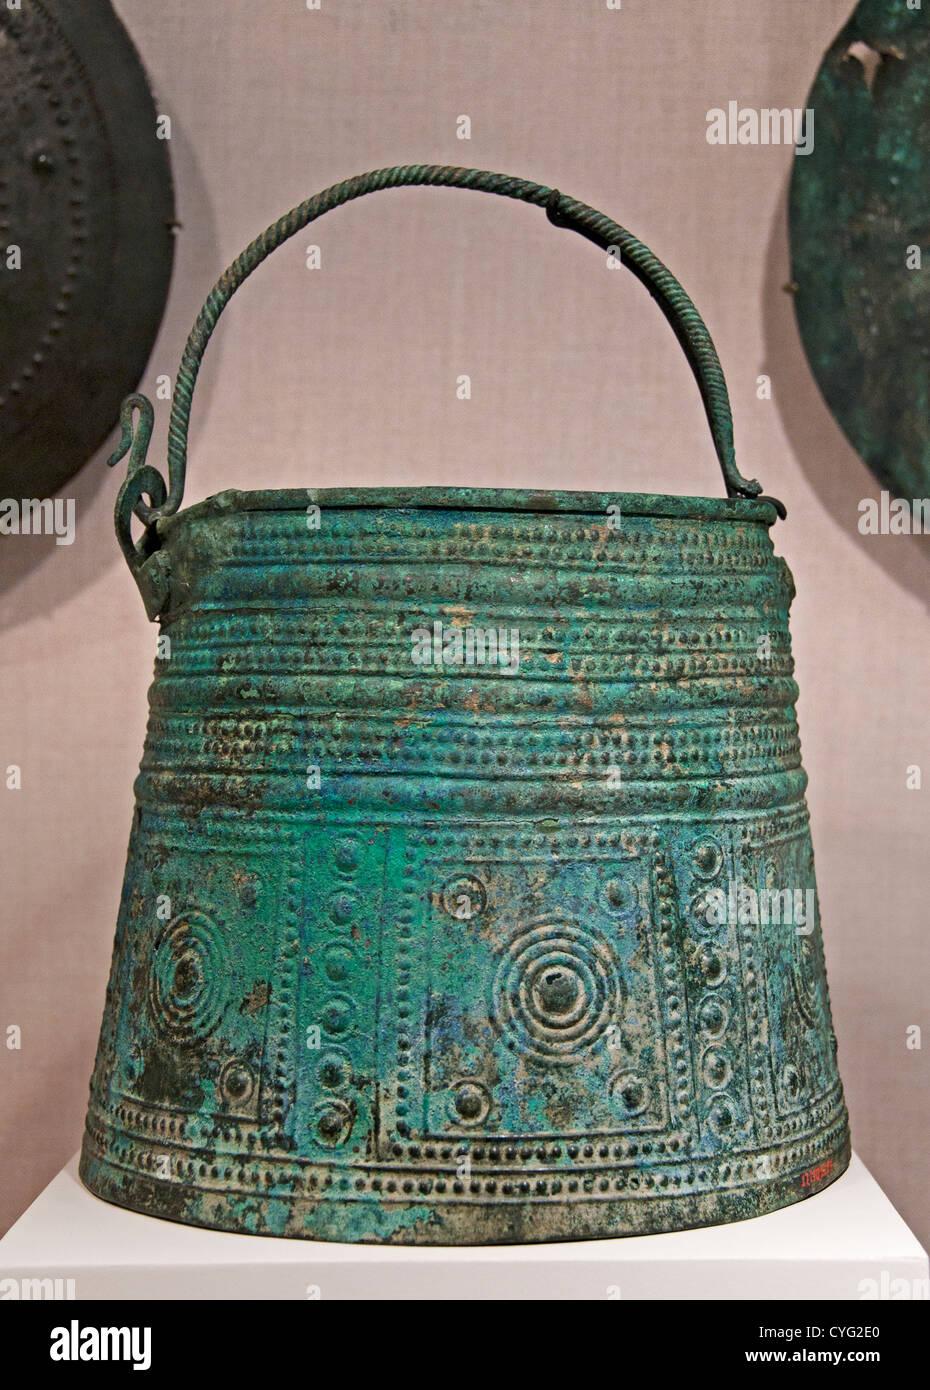 Bronze situla bucket 8th century BC Villanovan 20 cm Villanovan culture was the earliest Iron Age Italy  Bronze - Stock Image